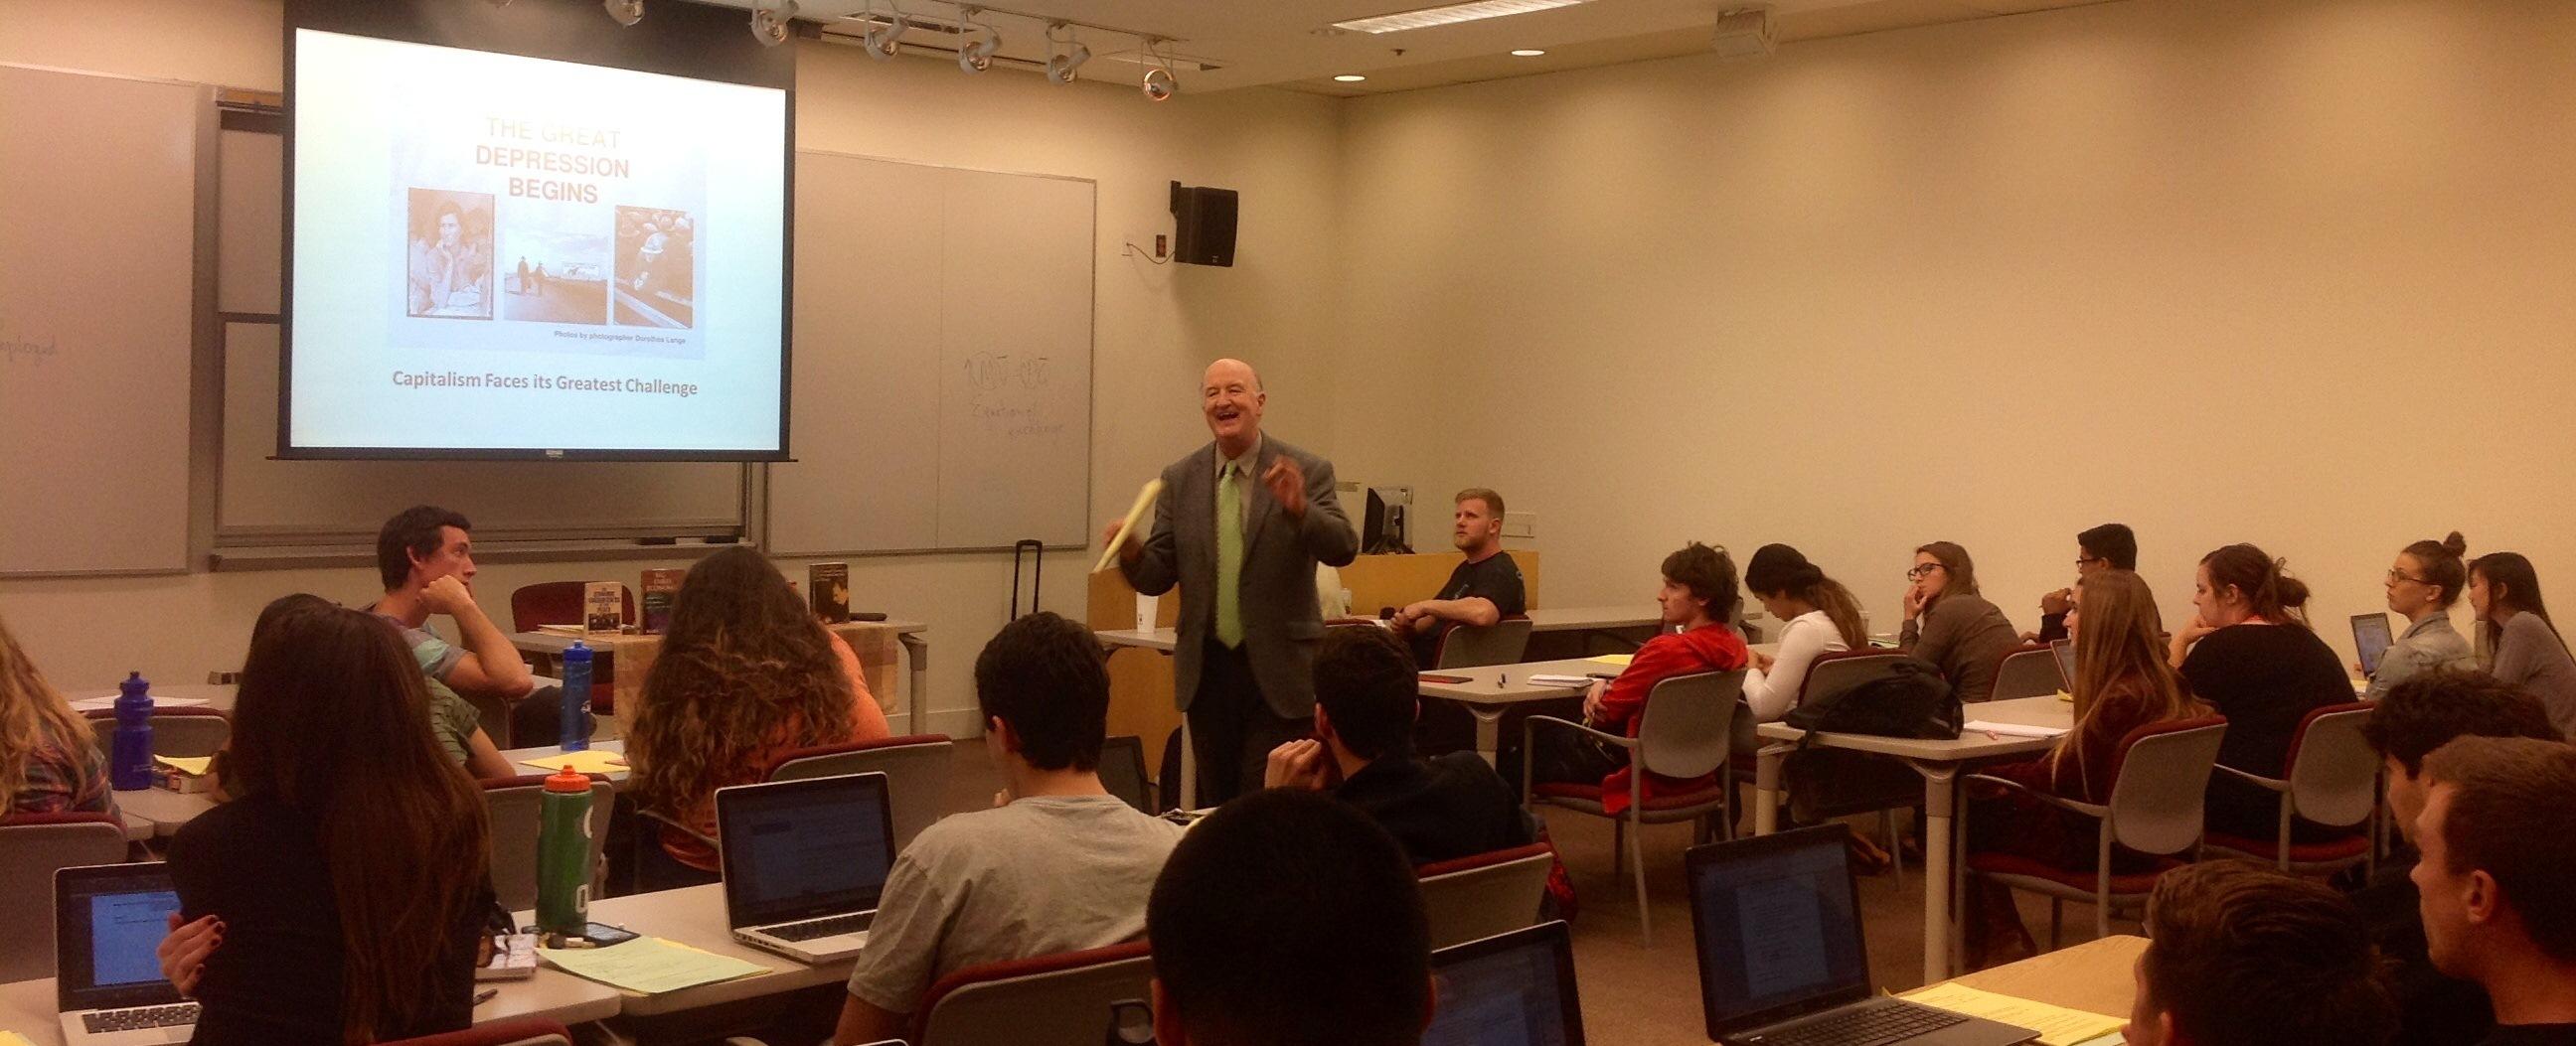 man speaking to classroom